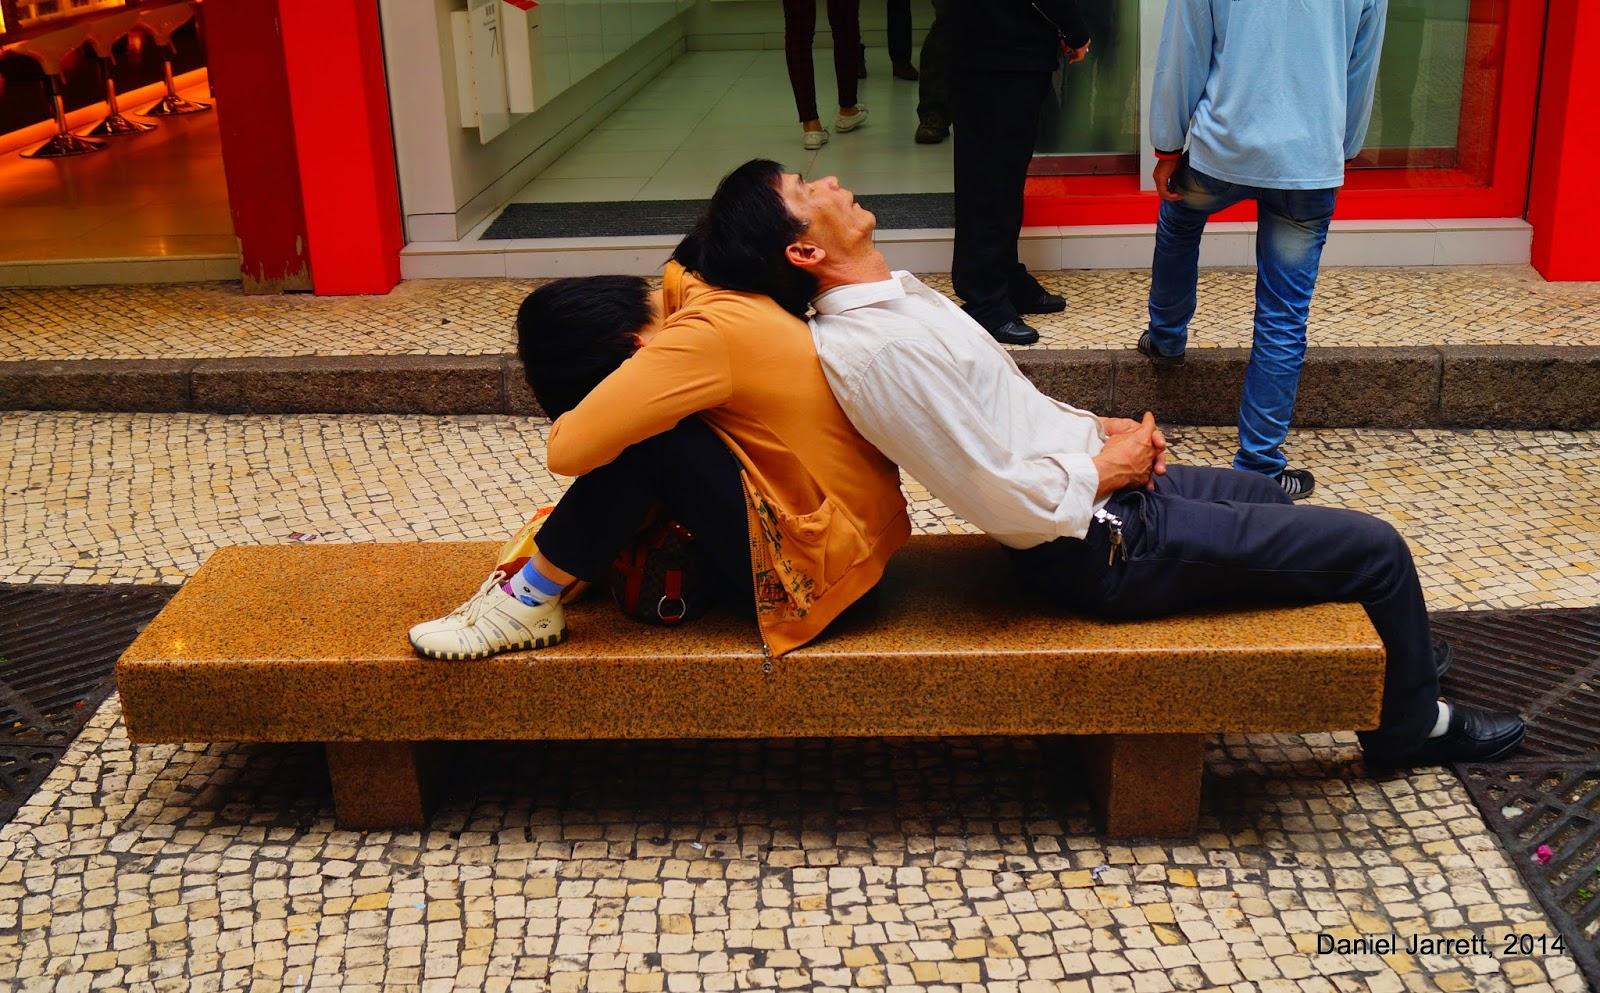 Macau and the art of sleeping